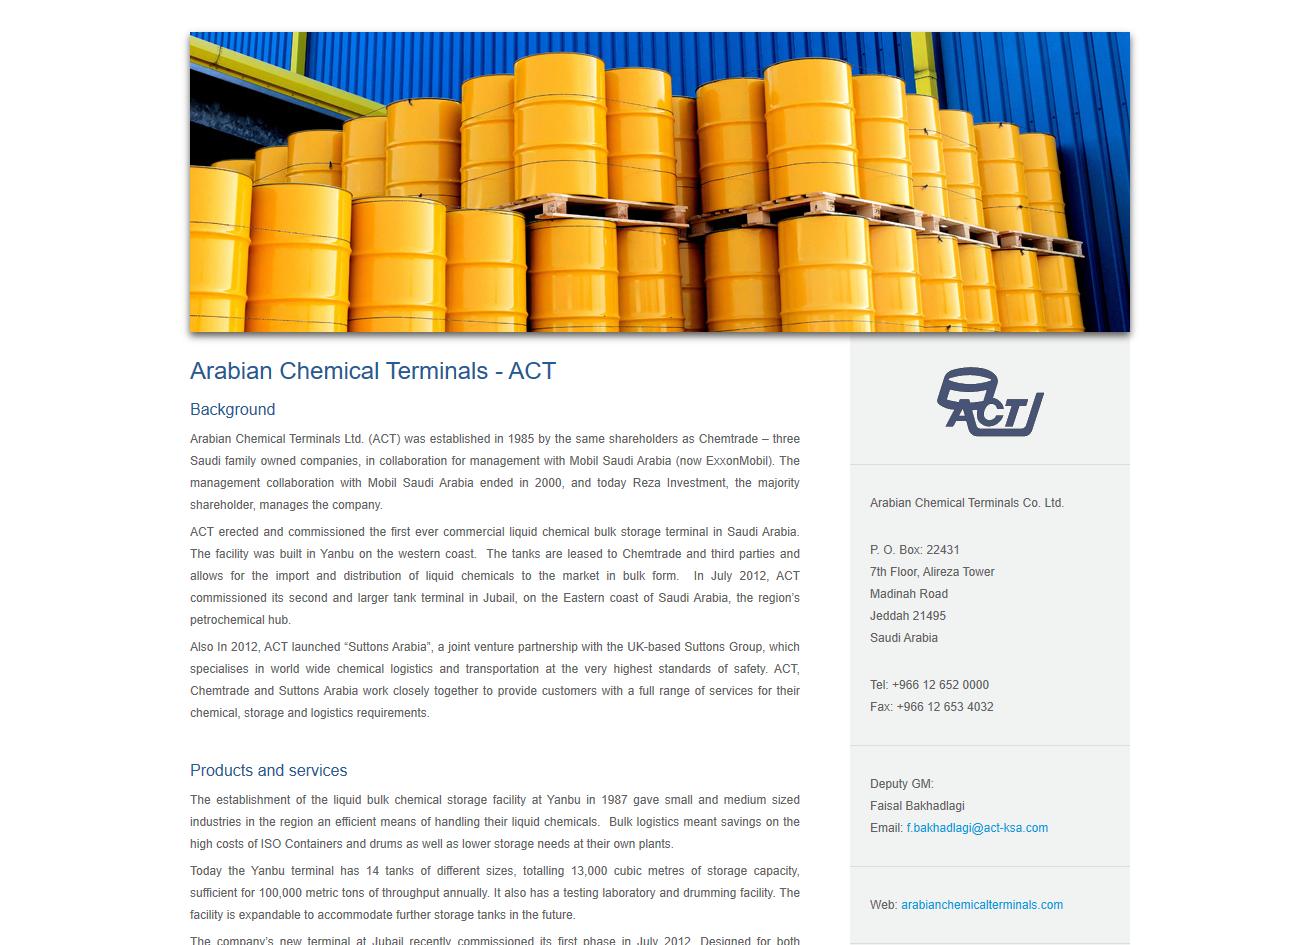 Arabian Chemical Terminals - web copy